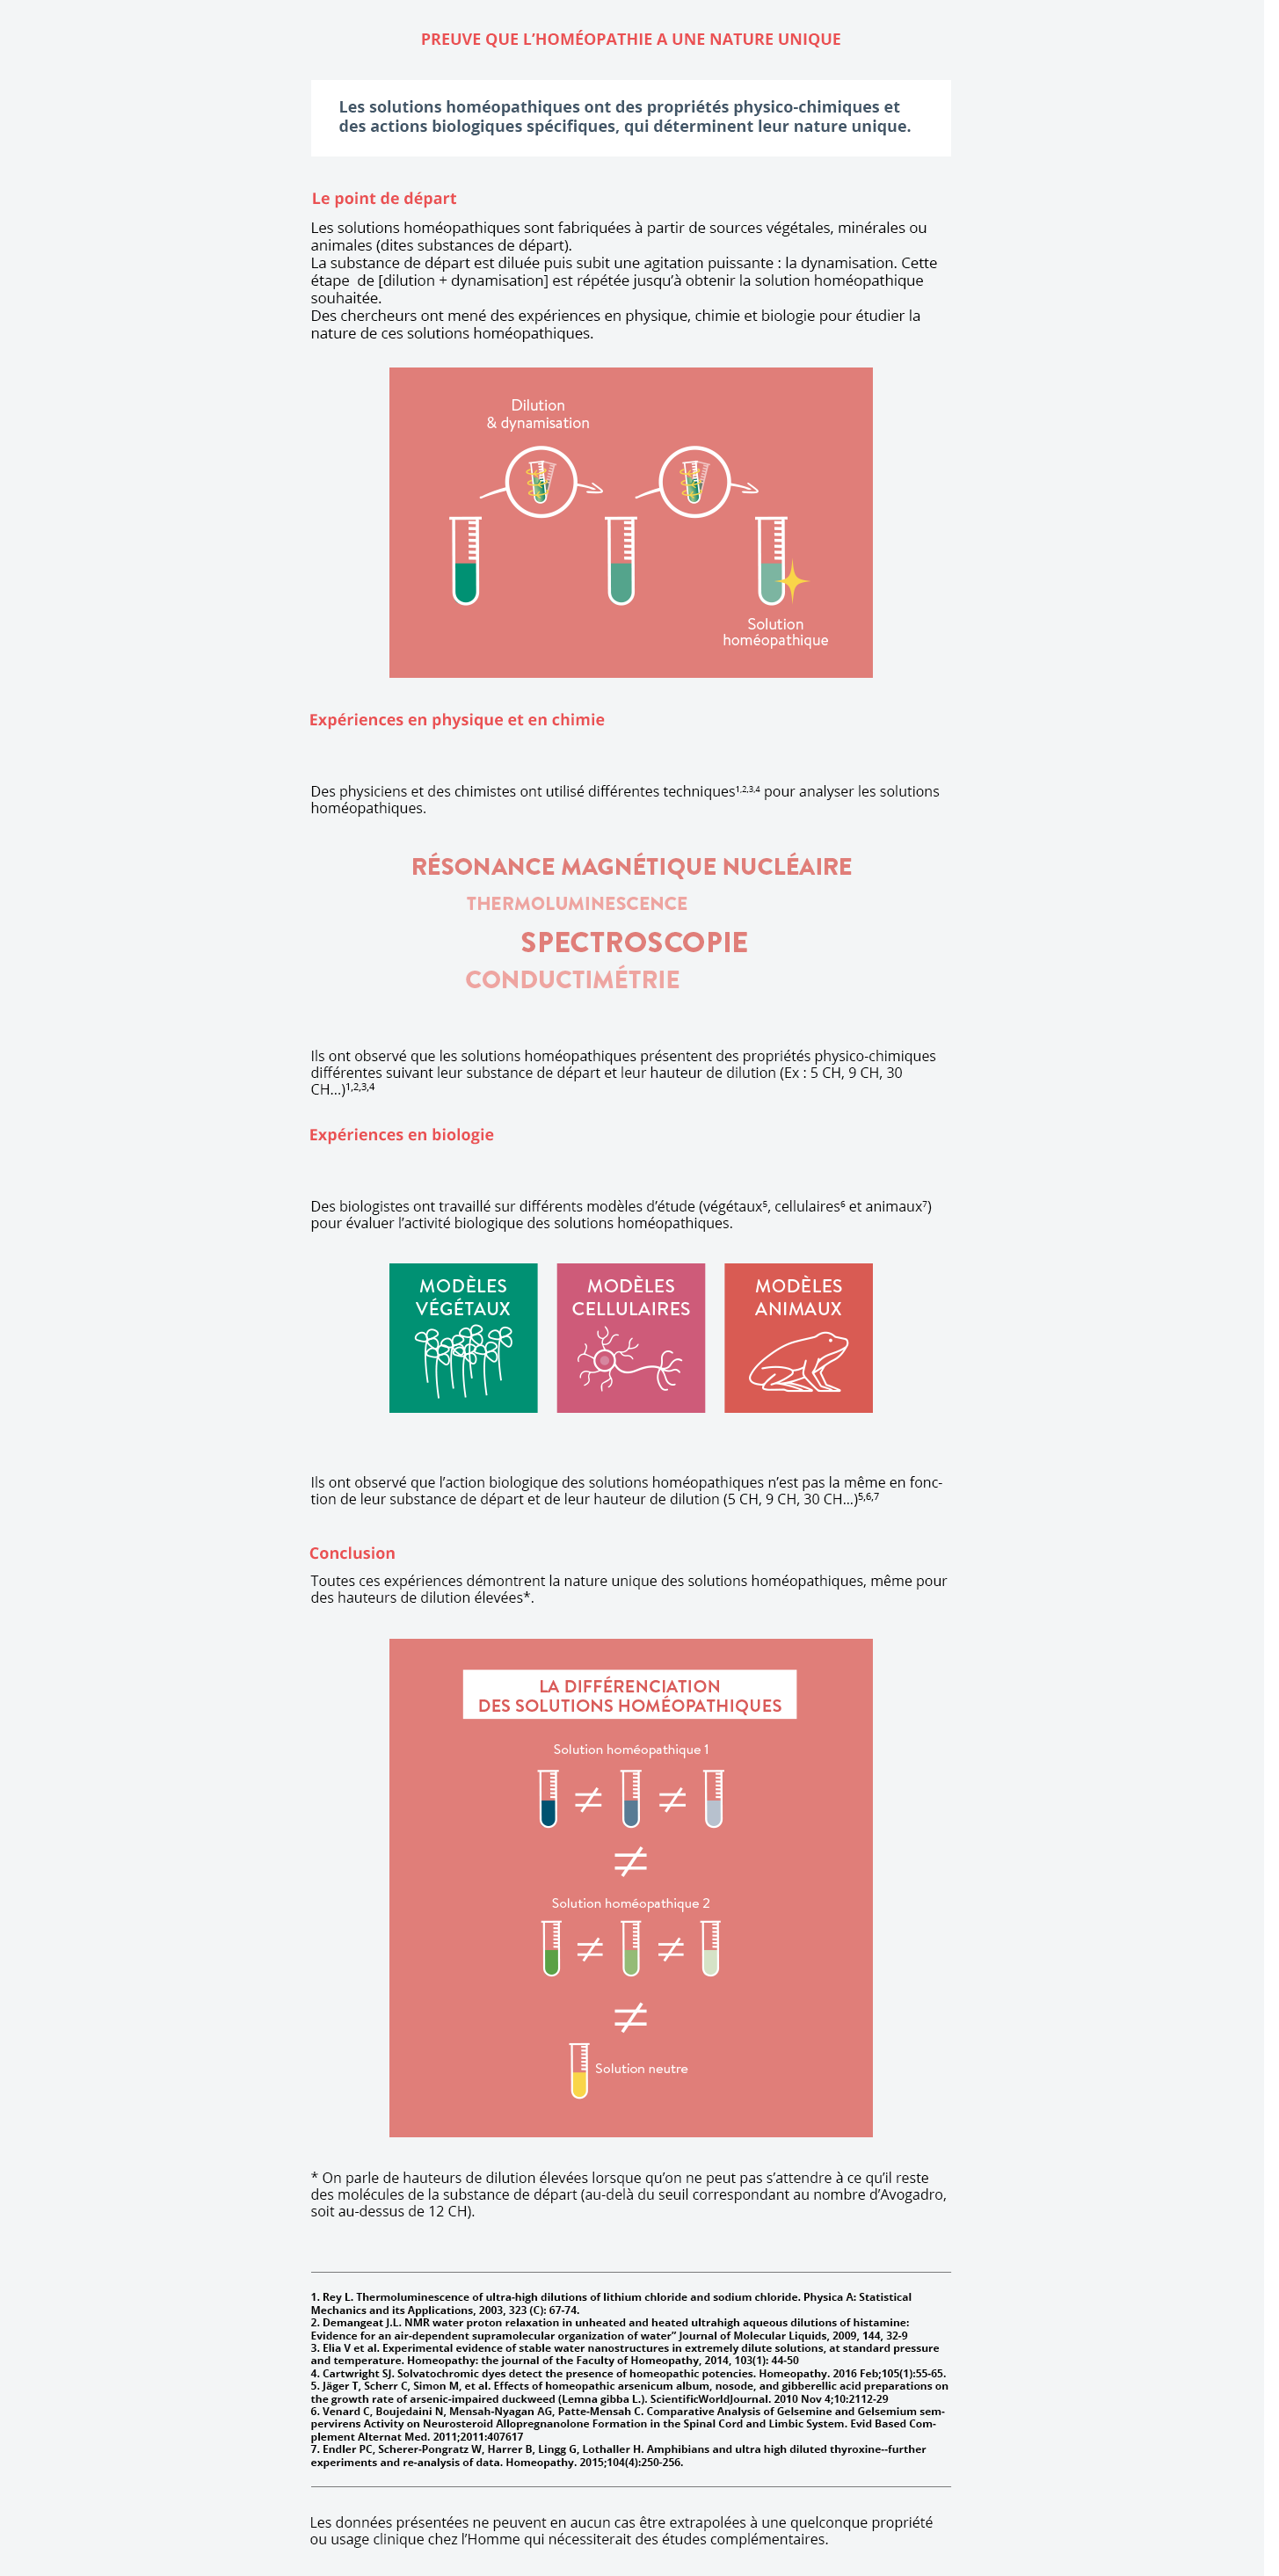 Landing page_FR_proprietes_remarquables